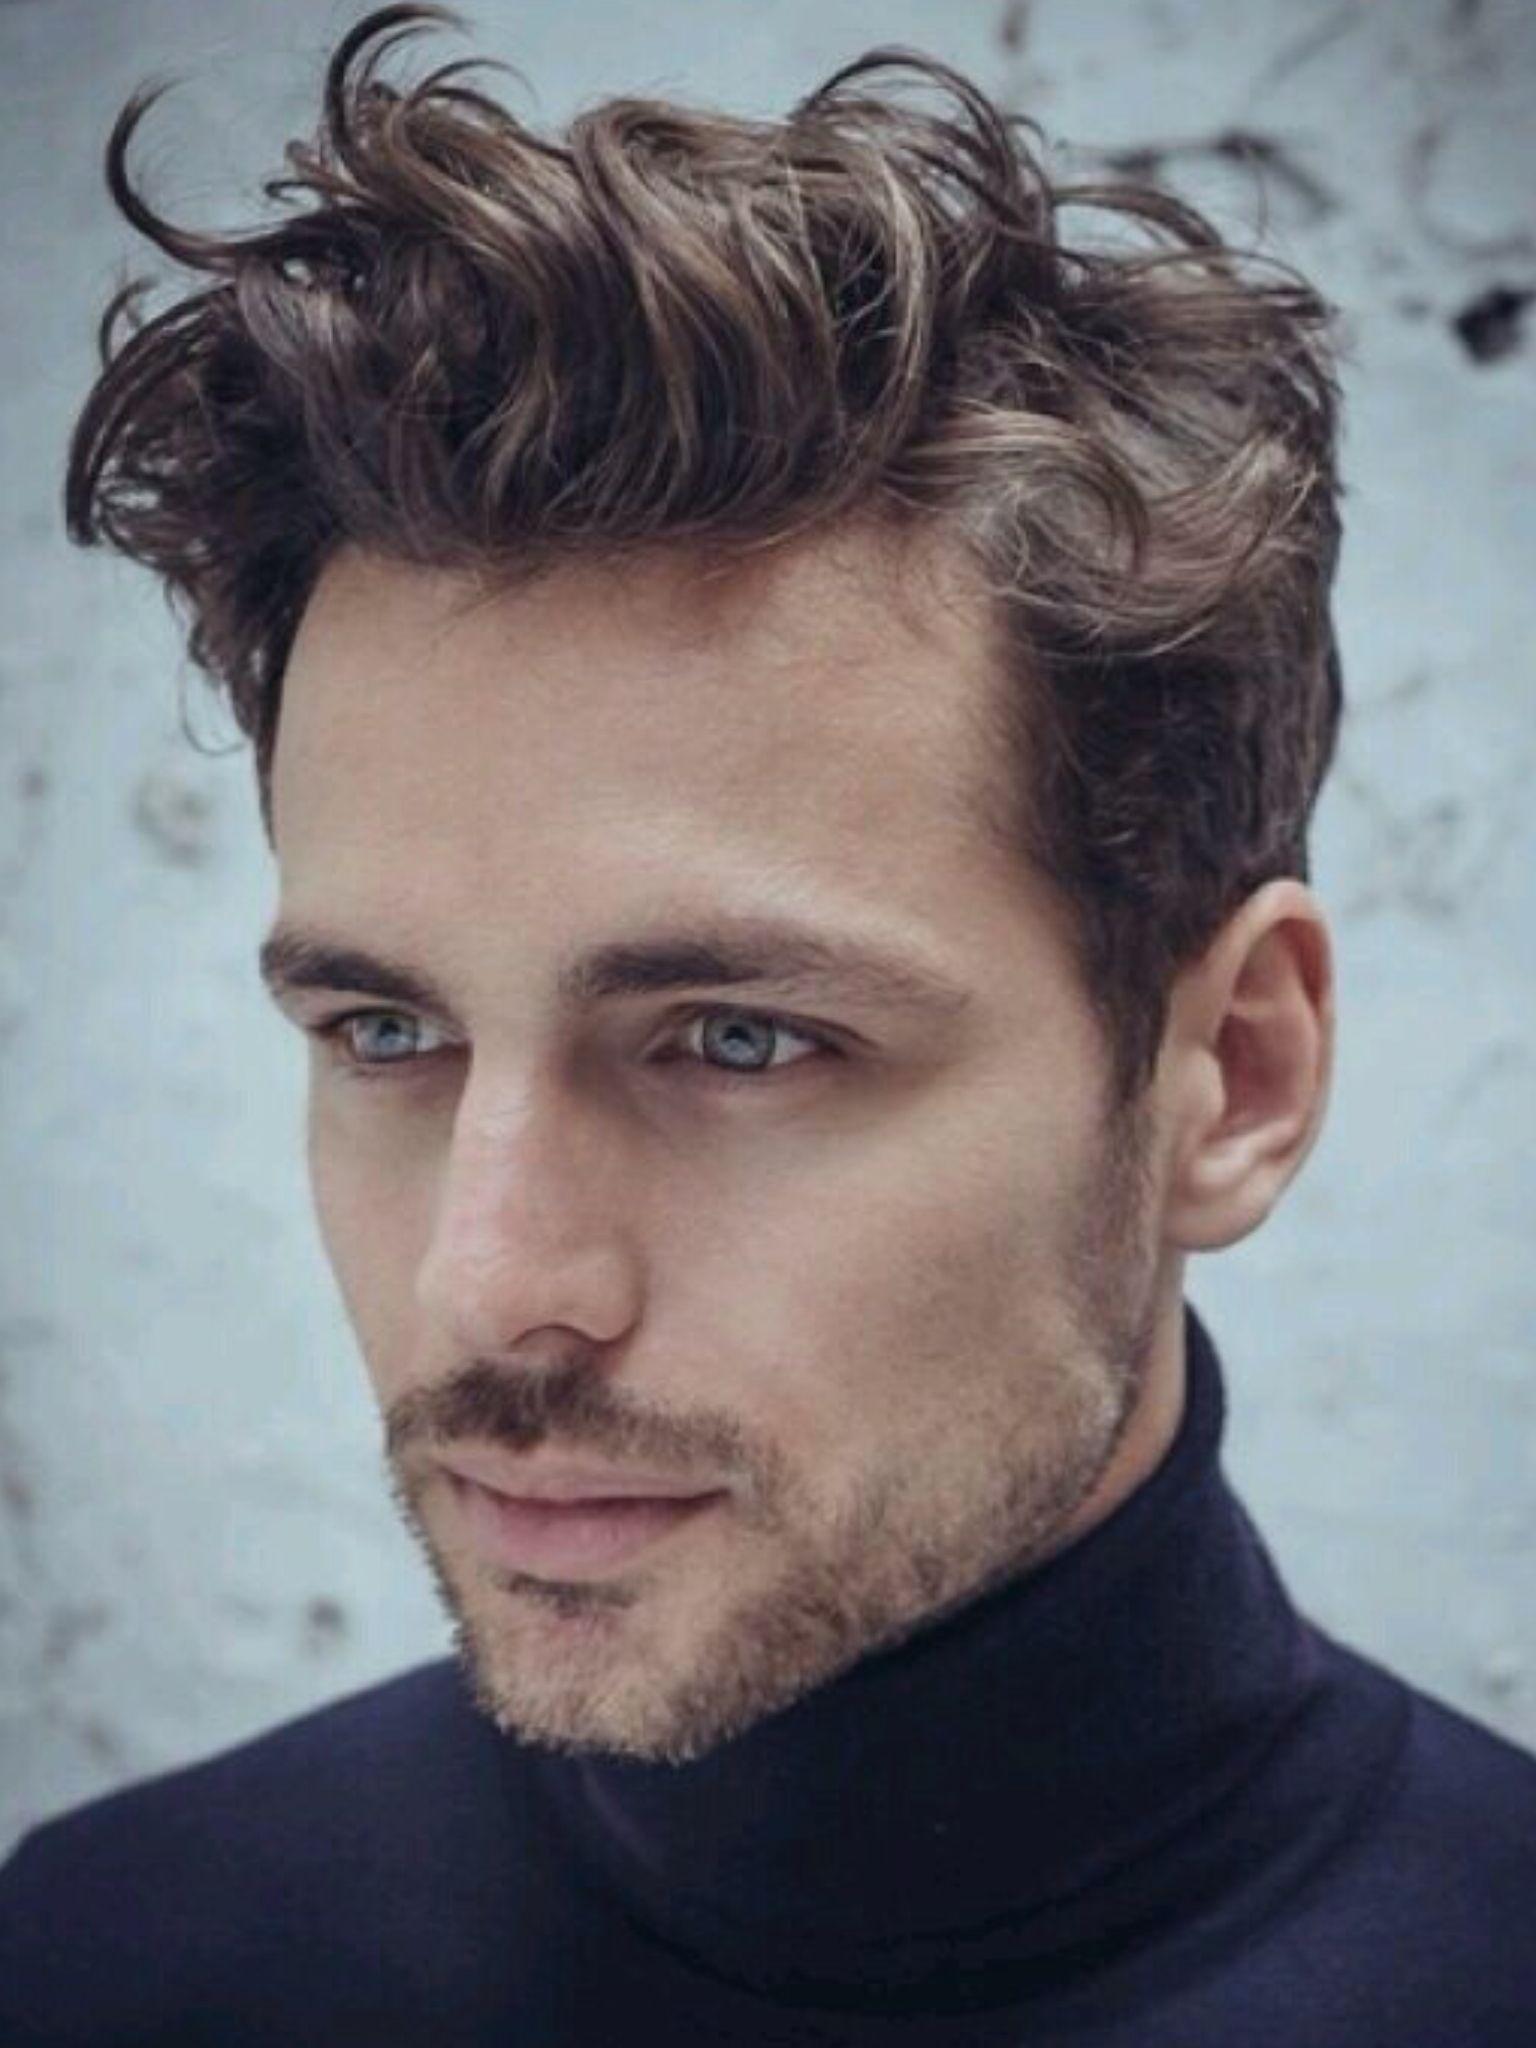 hair # men's style | hair | pinterest | haircuts, hair style and man